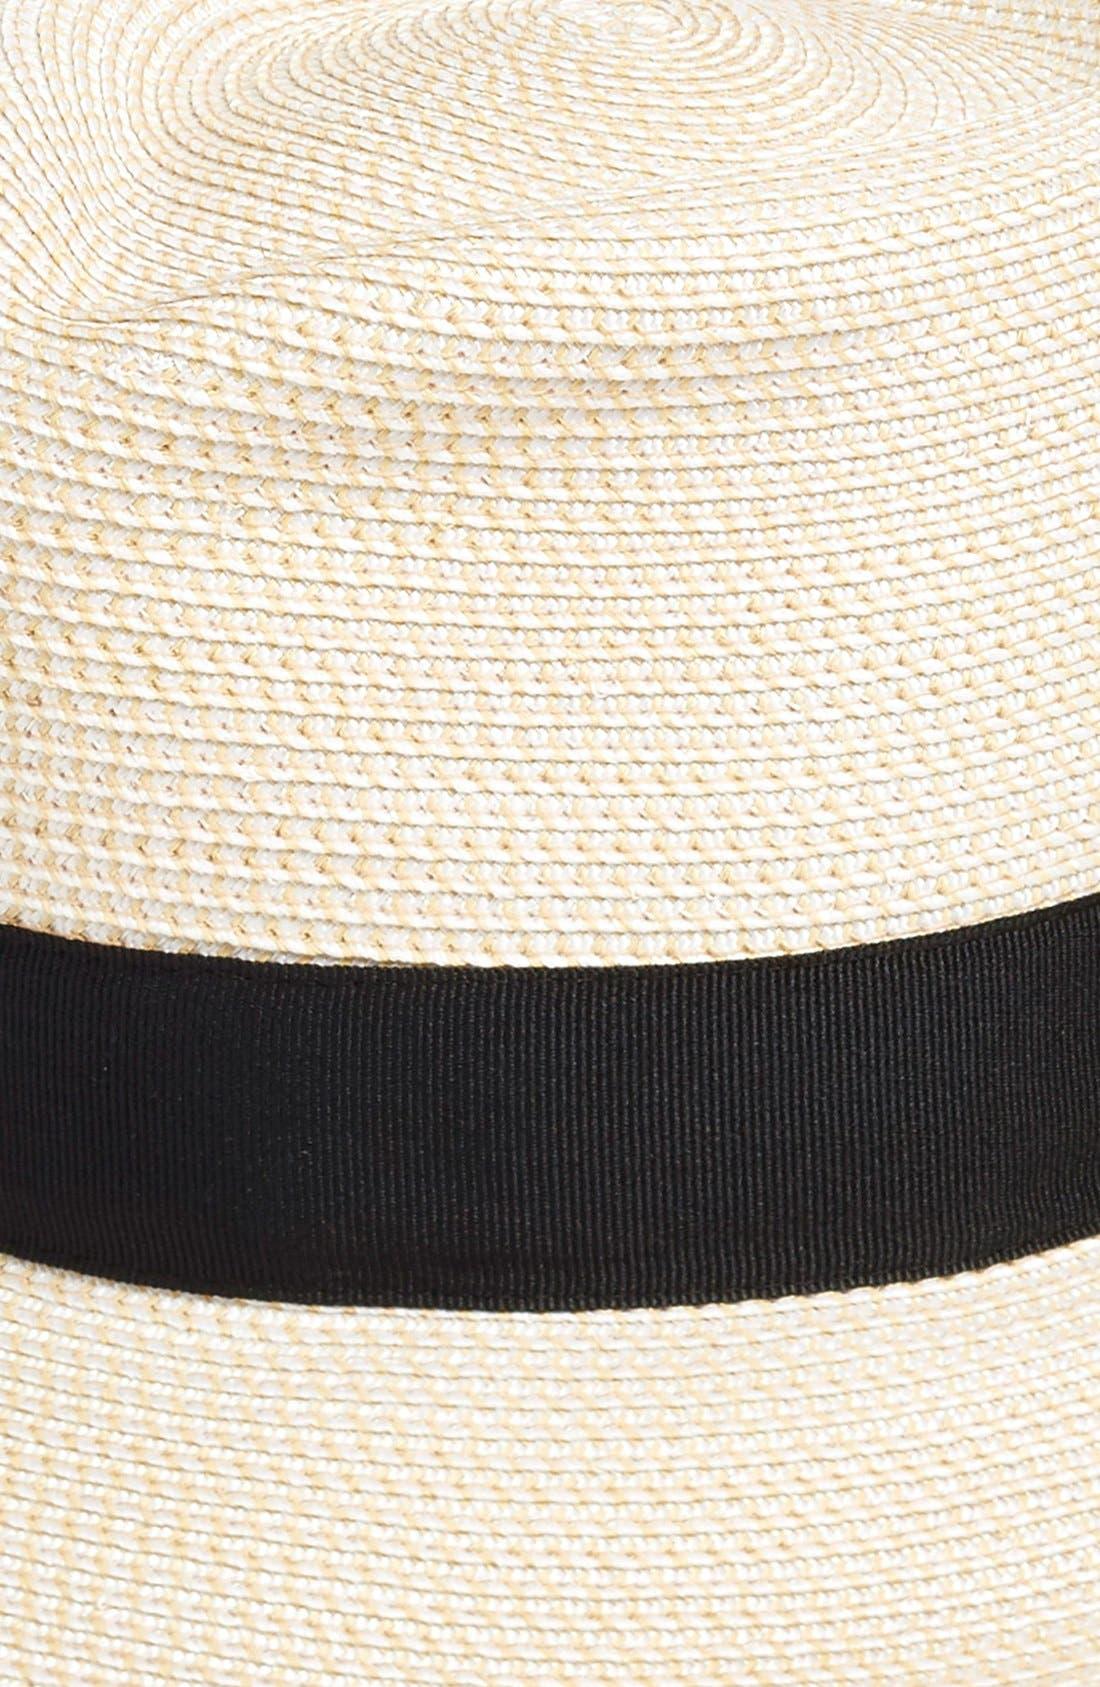 Alternate Image 2  - Eric Javits 'Classic' Squishee® Packable Fedora Sun Hat